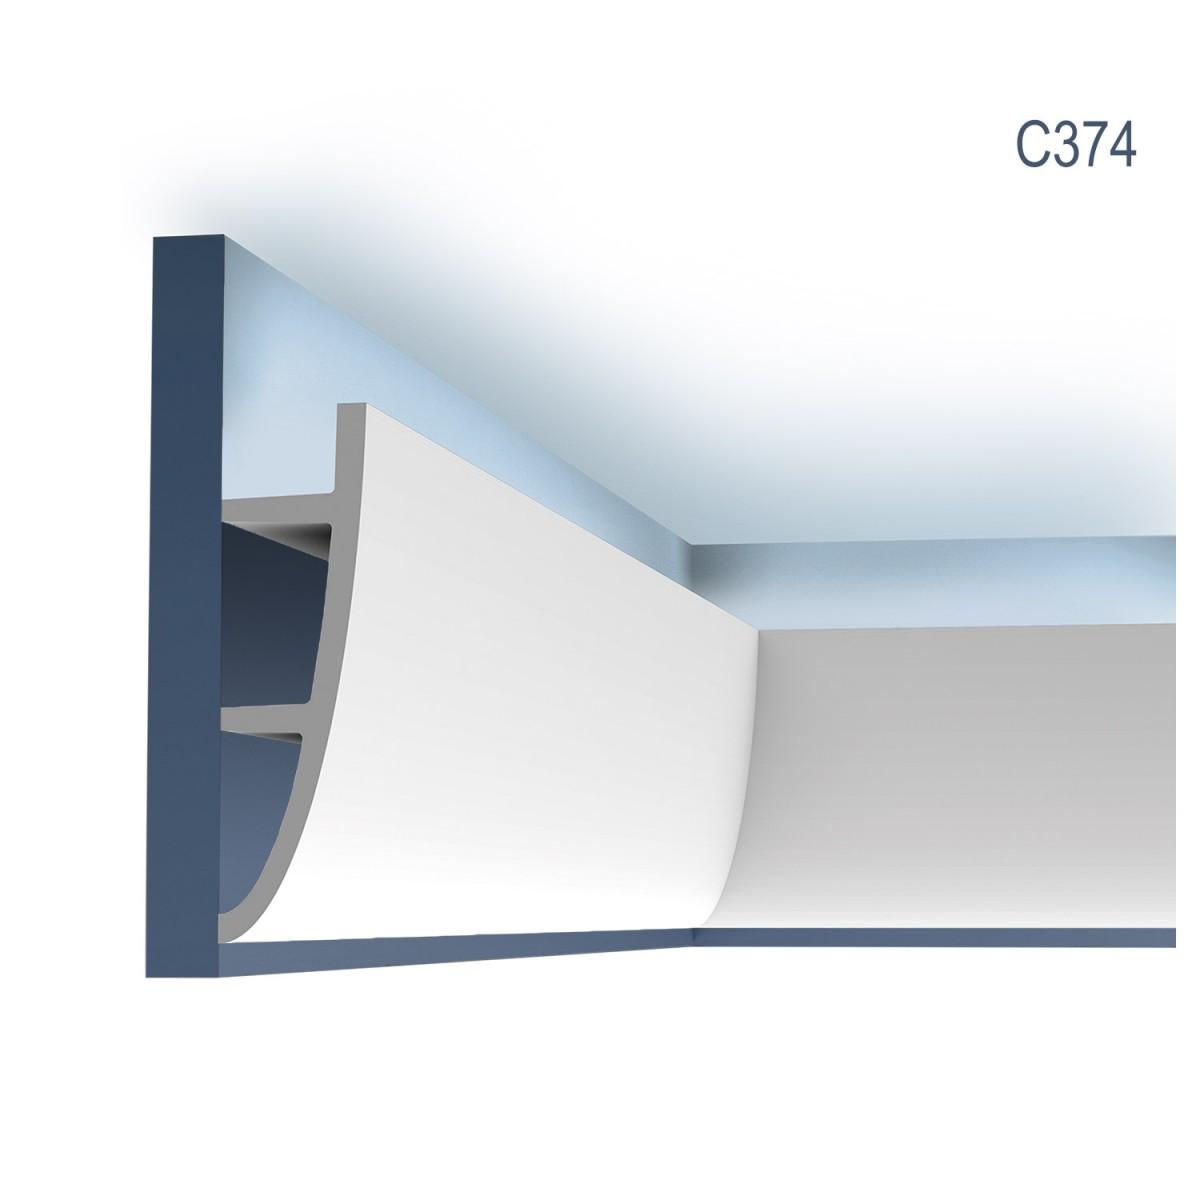 Cornisa Ulf Moritz C374, Dimensiuni: 200 X 18 X 5 cm, Orac Decor